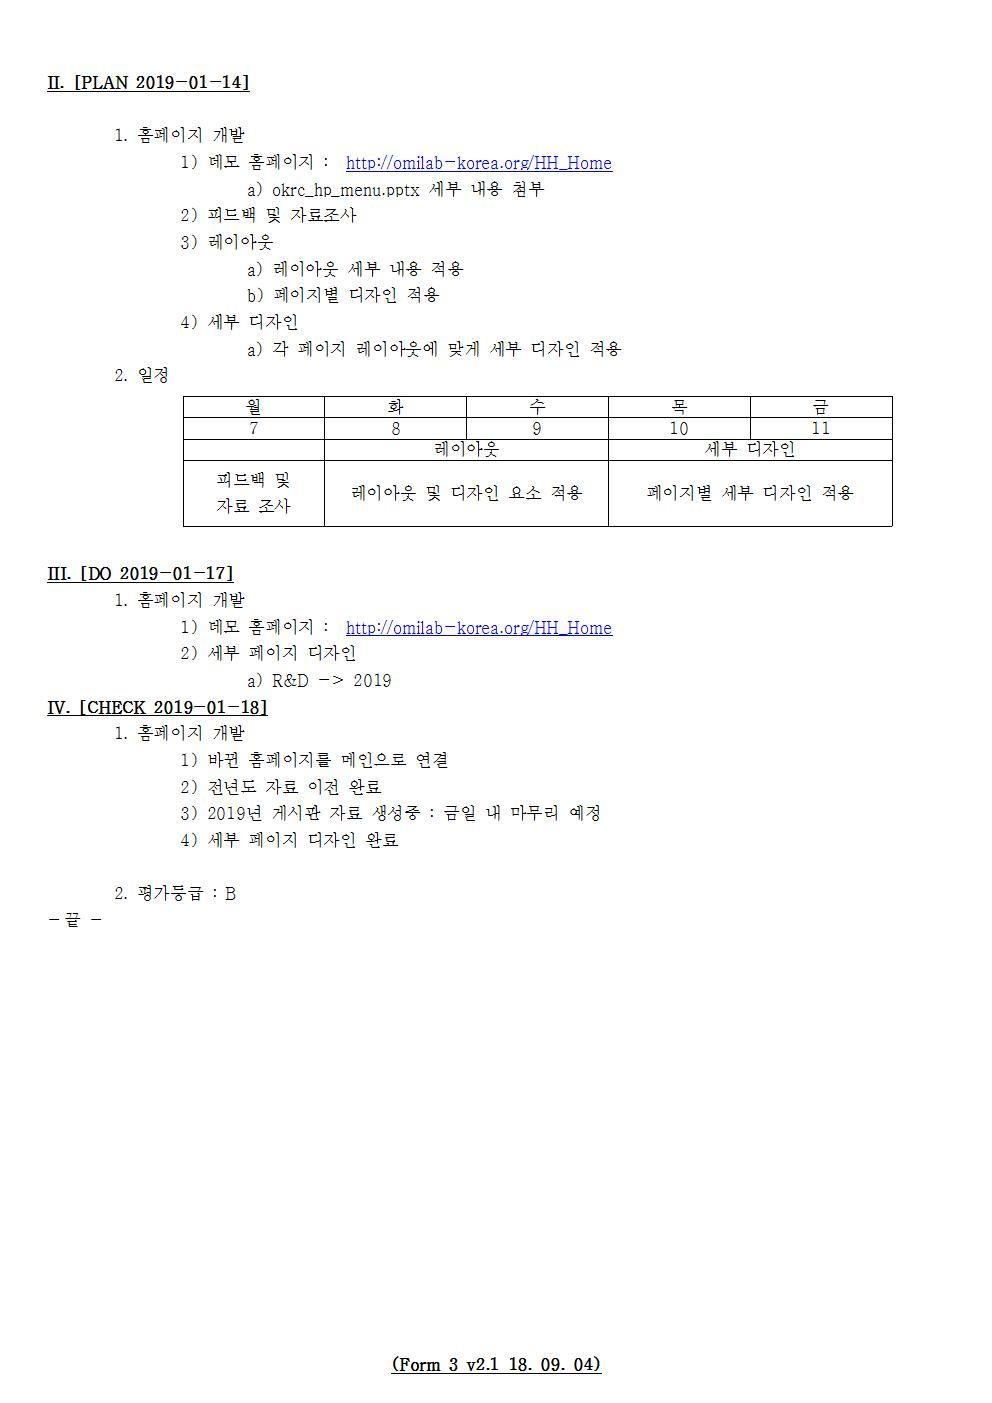 D-[19-021-RC-03]-[OKRCHP V2.0]-[2019-01-18][HH]002.jpg